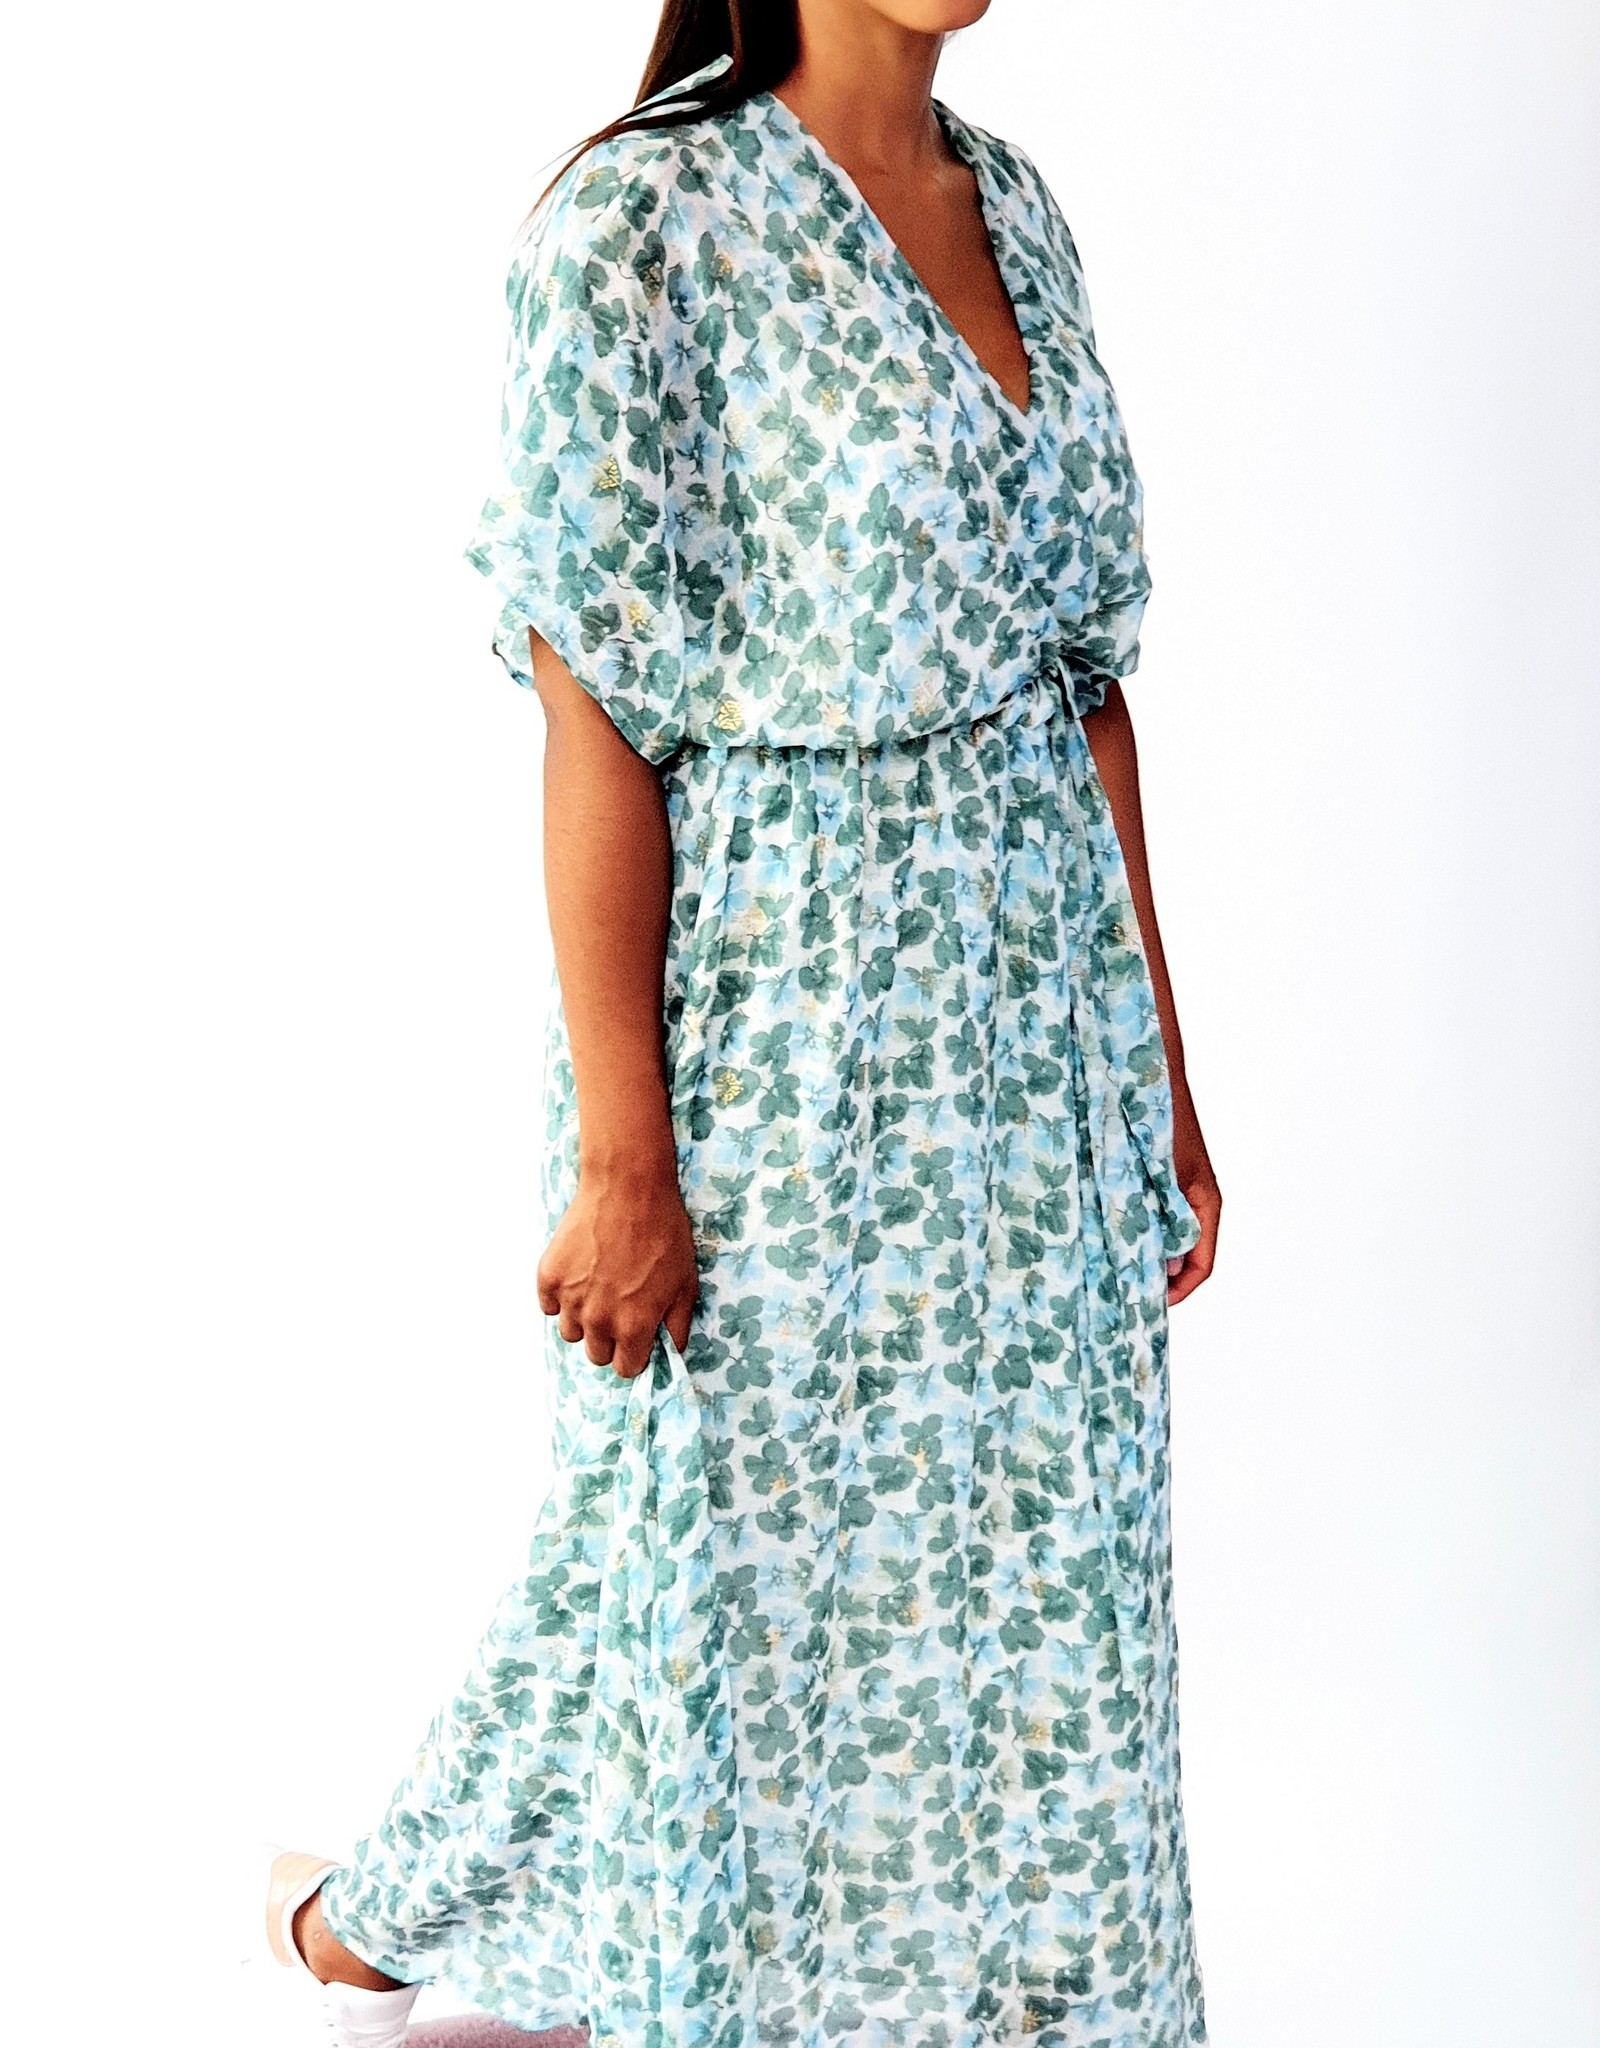 Thé sweet green dress